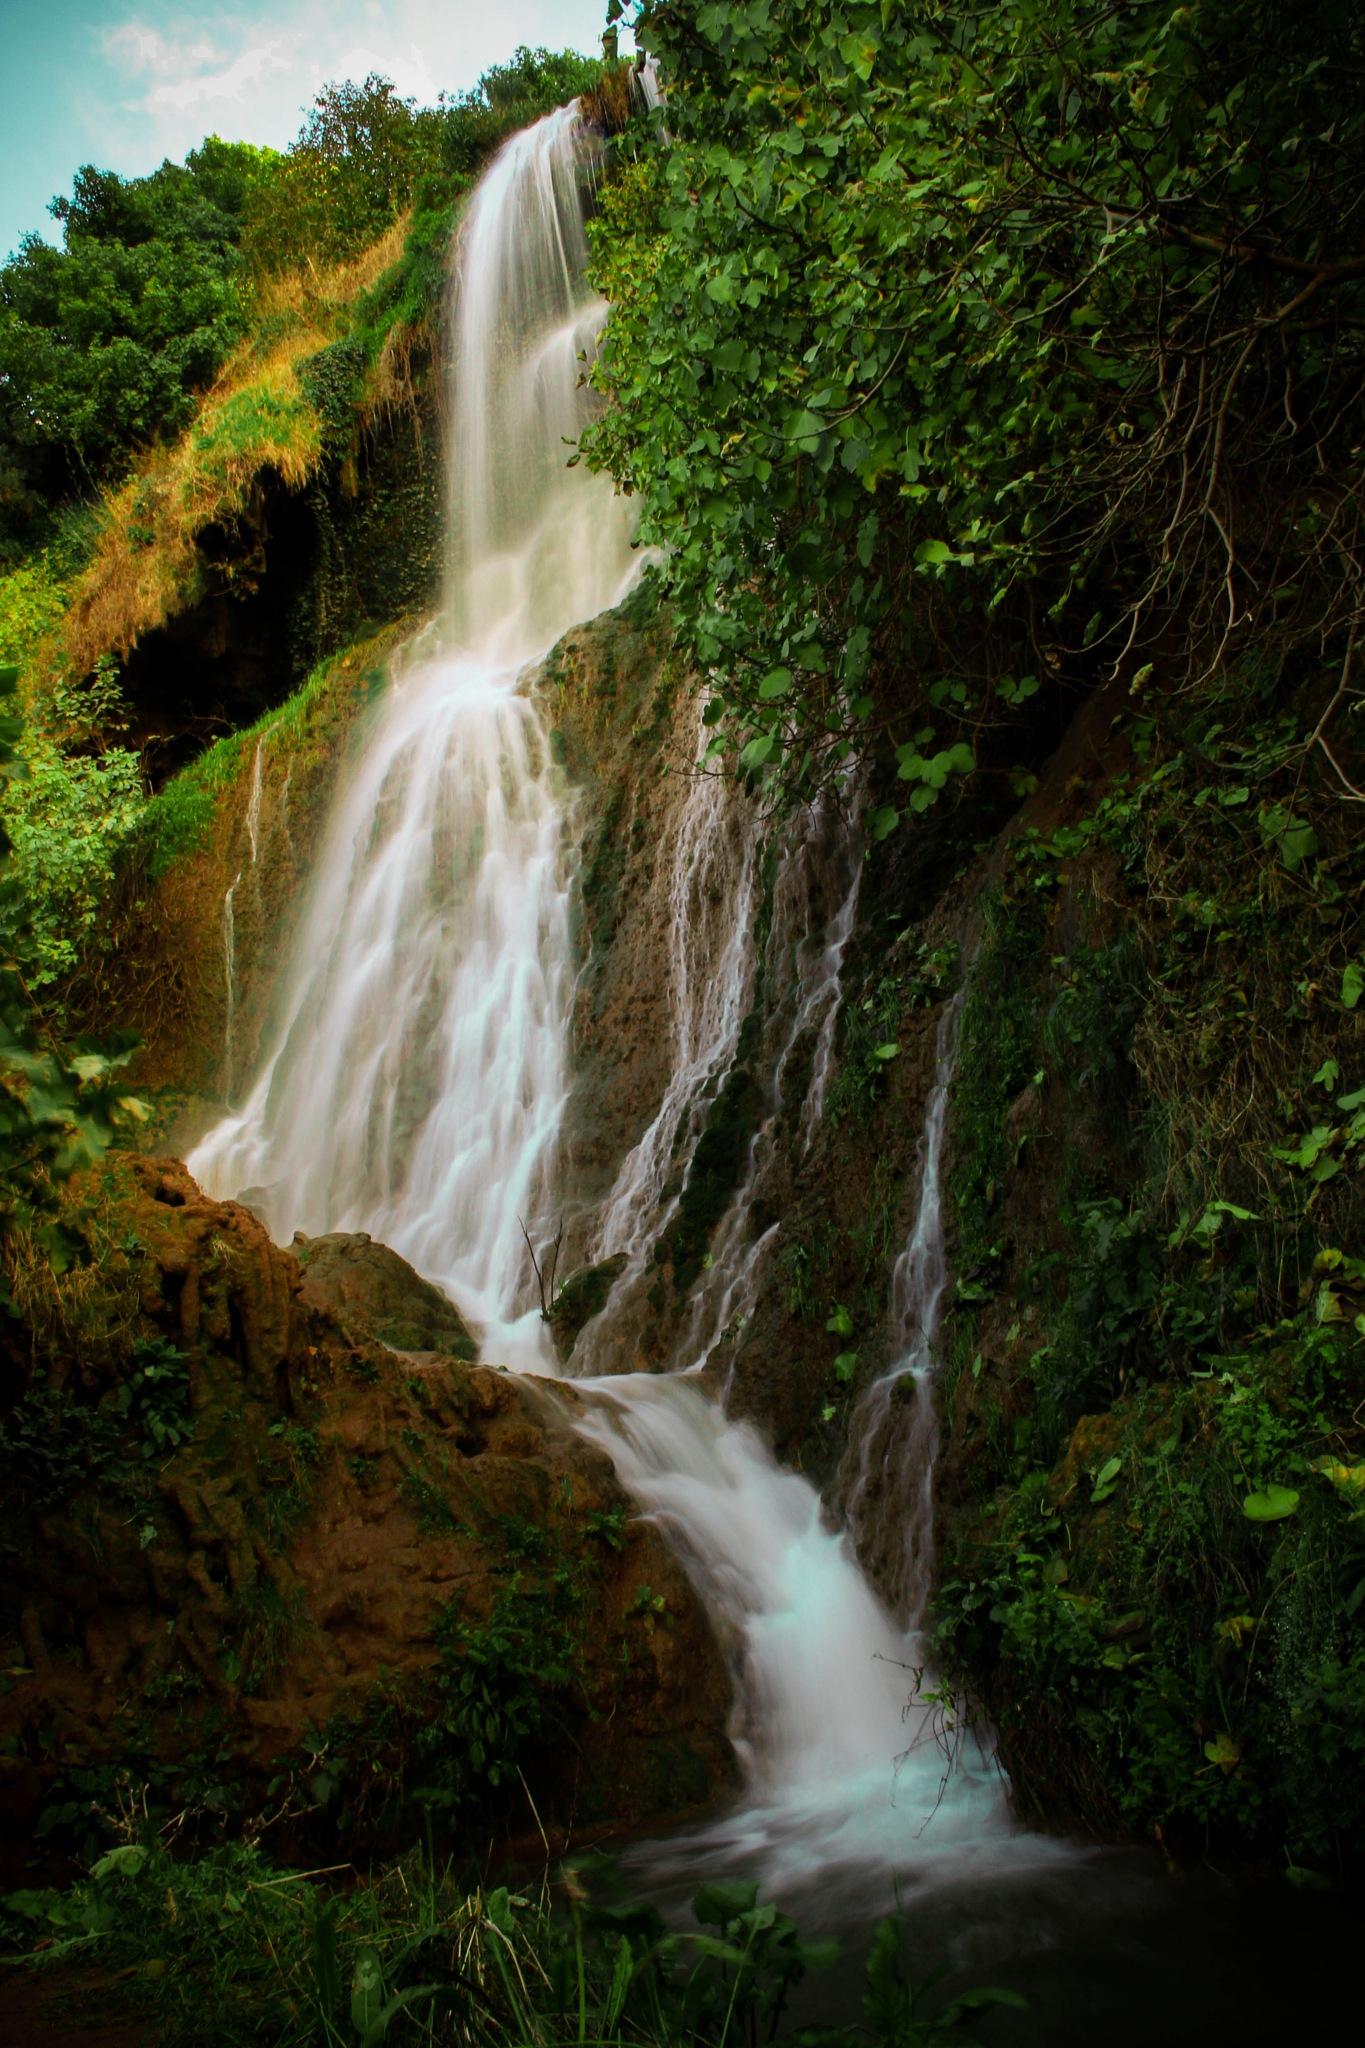 Waterfall by Ayyoub Lamara